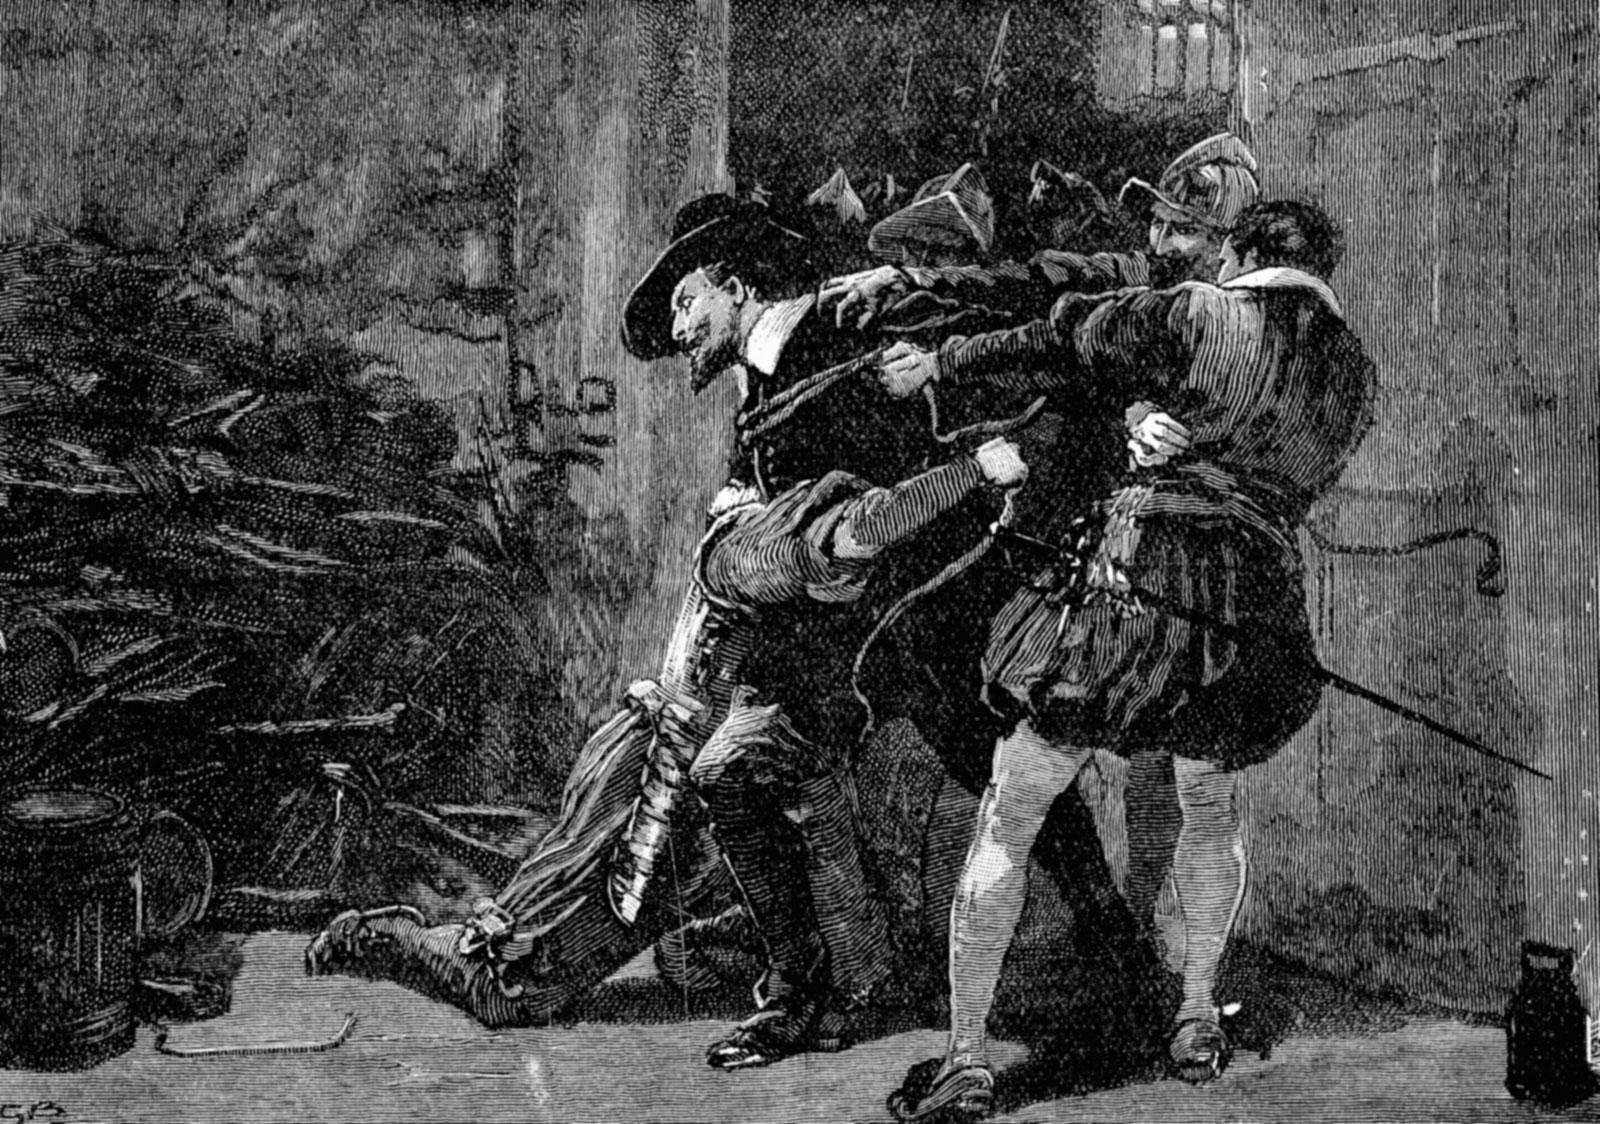 wood-engraving-Gunpowder-Plot-cellars-Guy-Fawkes